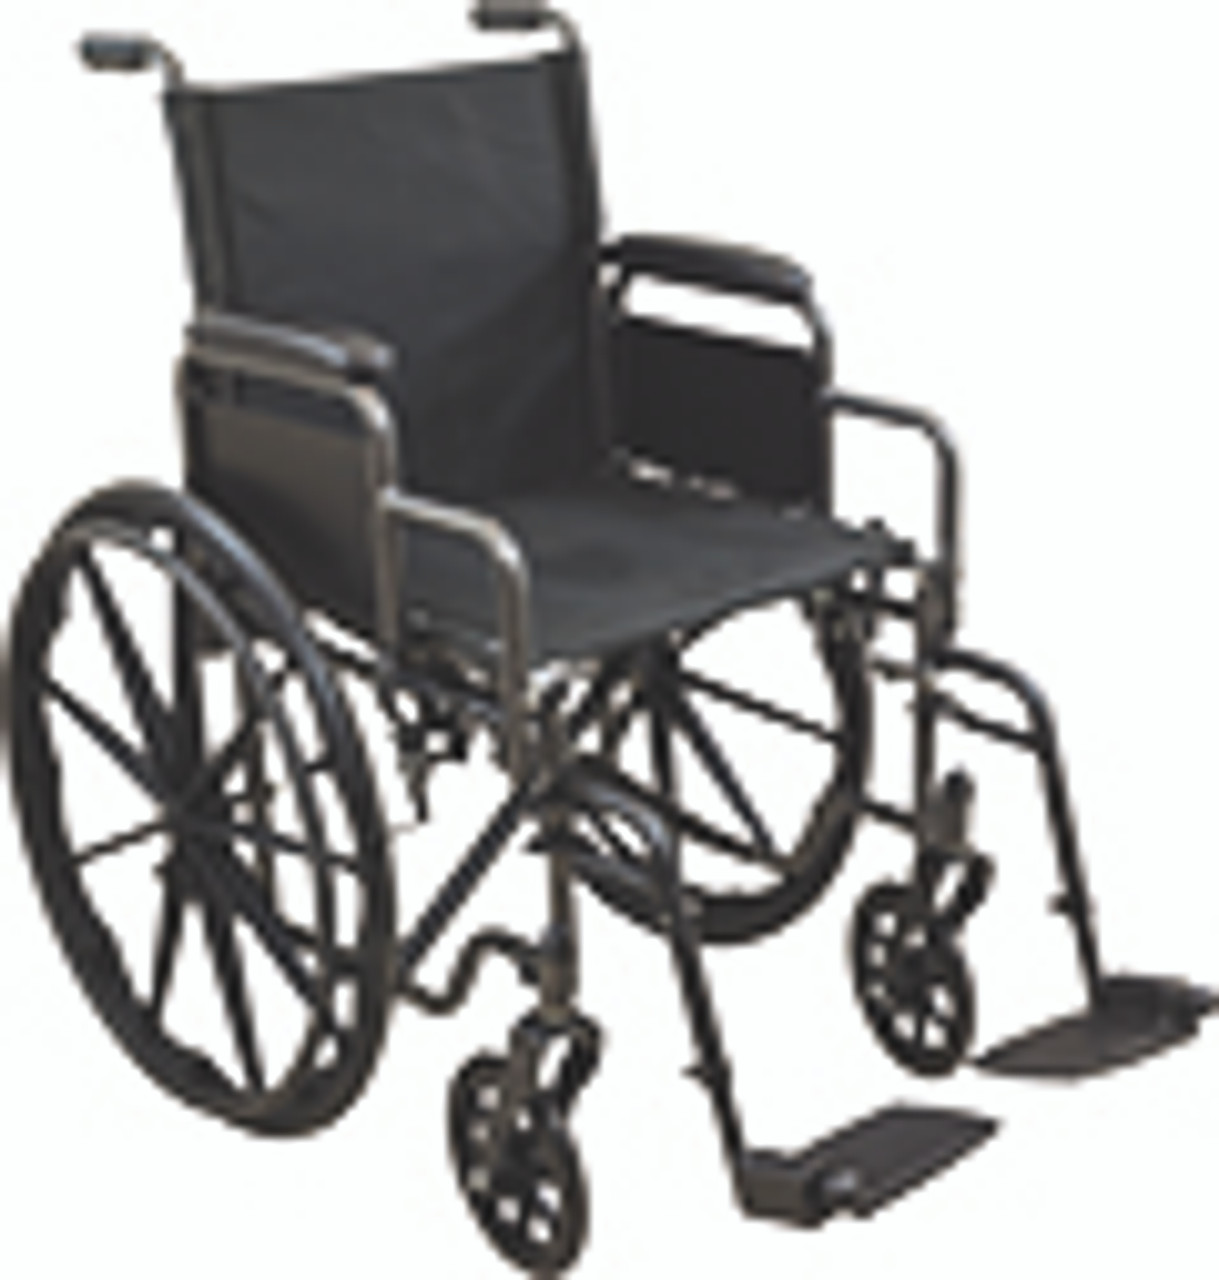 Refurbished Gently Used Wheelchair